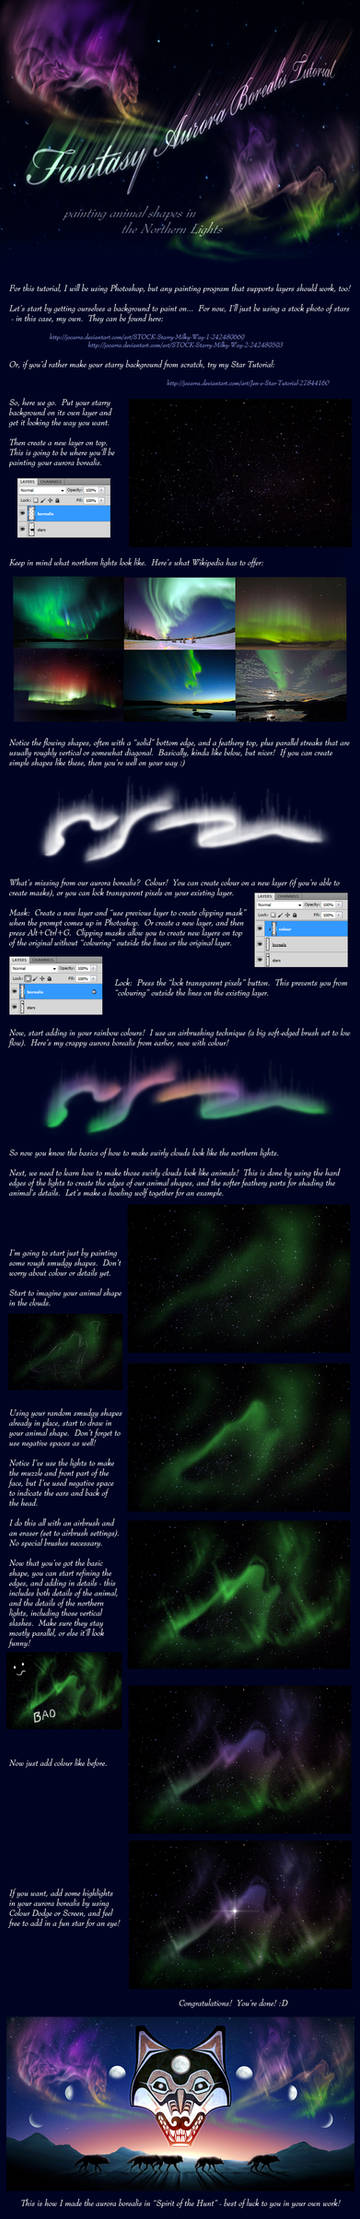 Fantasy Aurora Borealis Tutorial